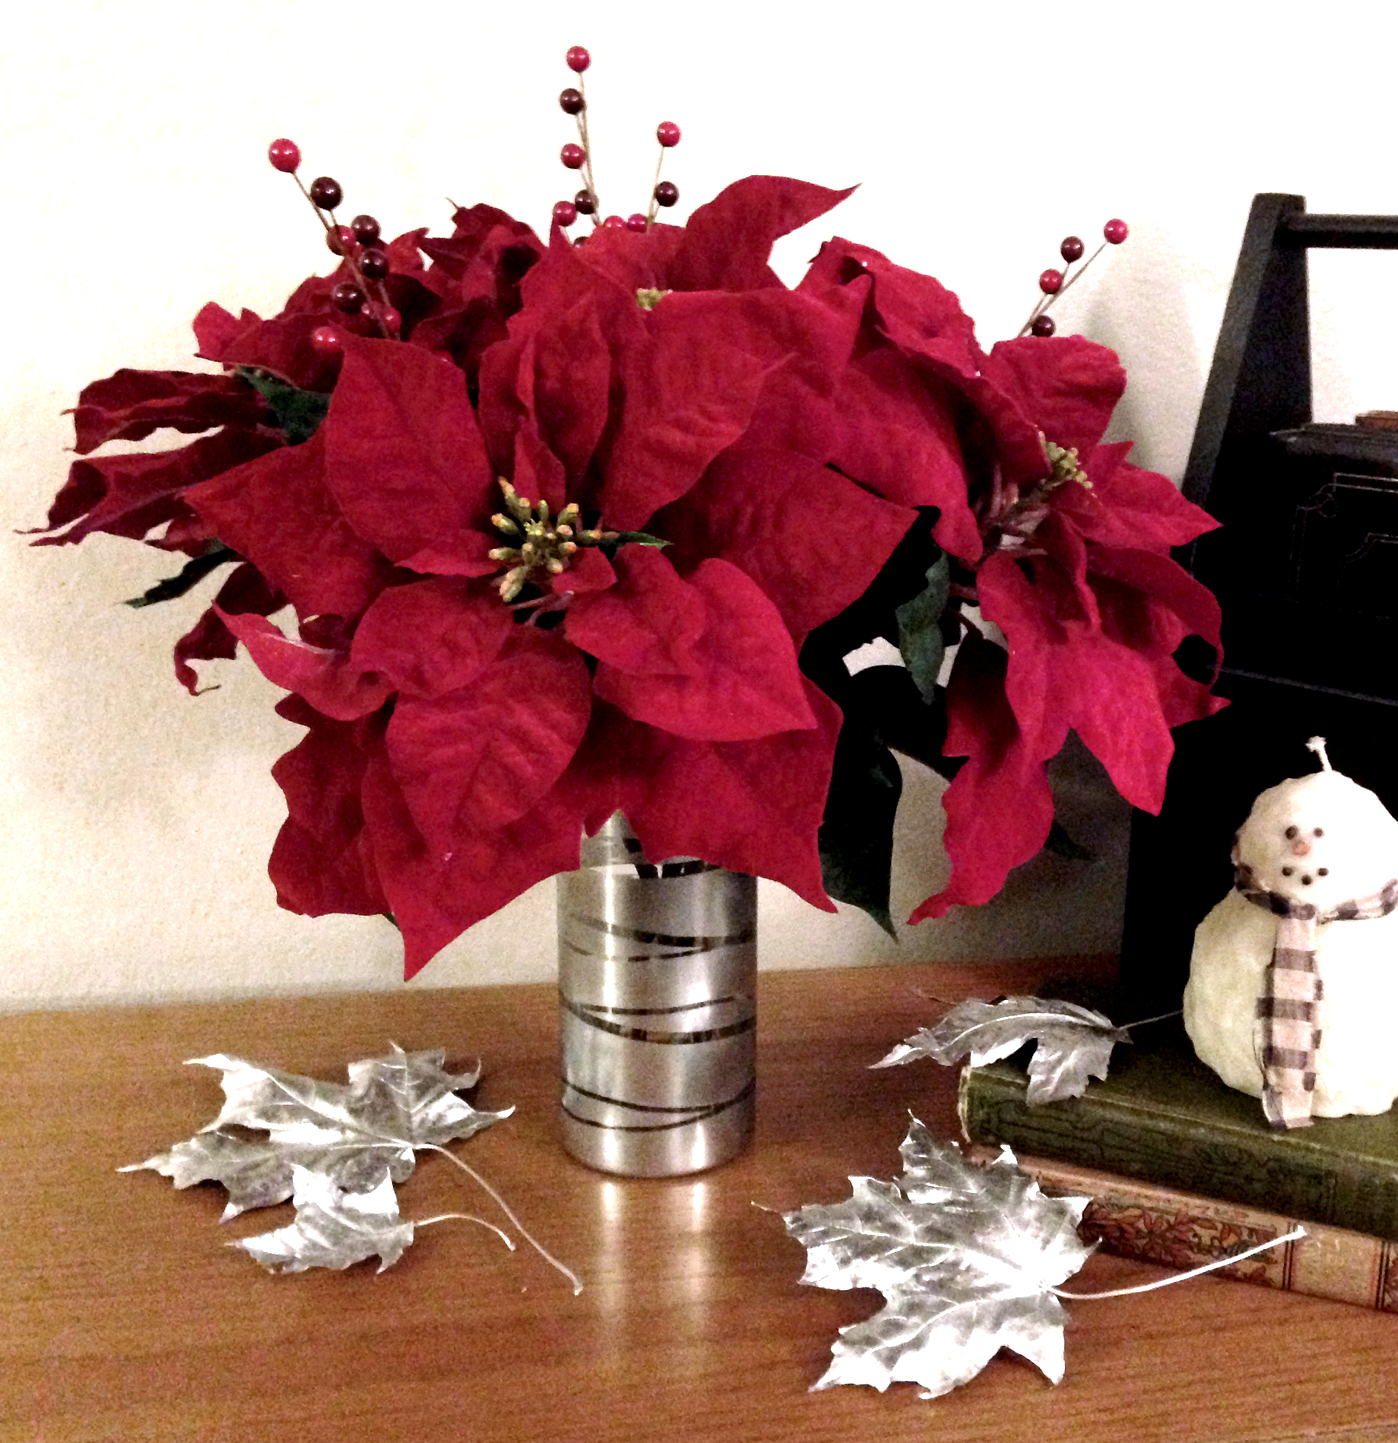 DIY poinsettia flower arrangement | Love My DIY Home